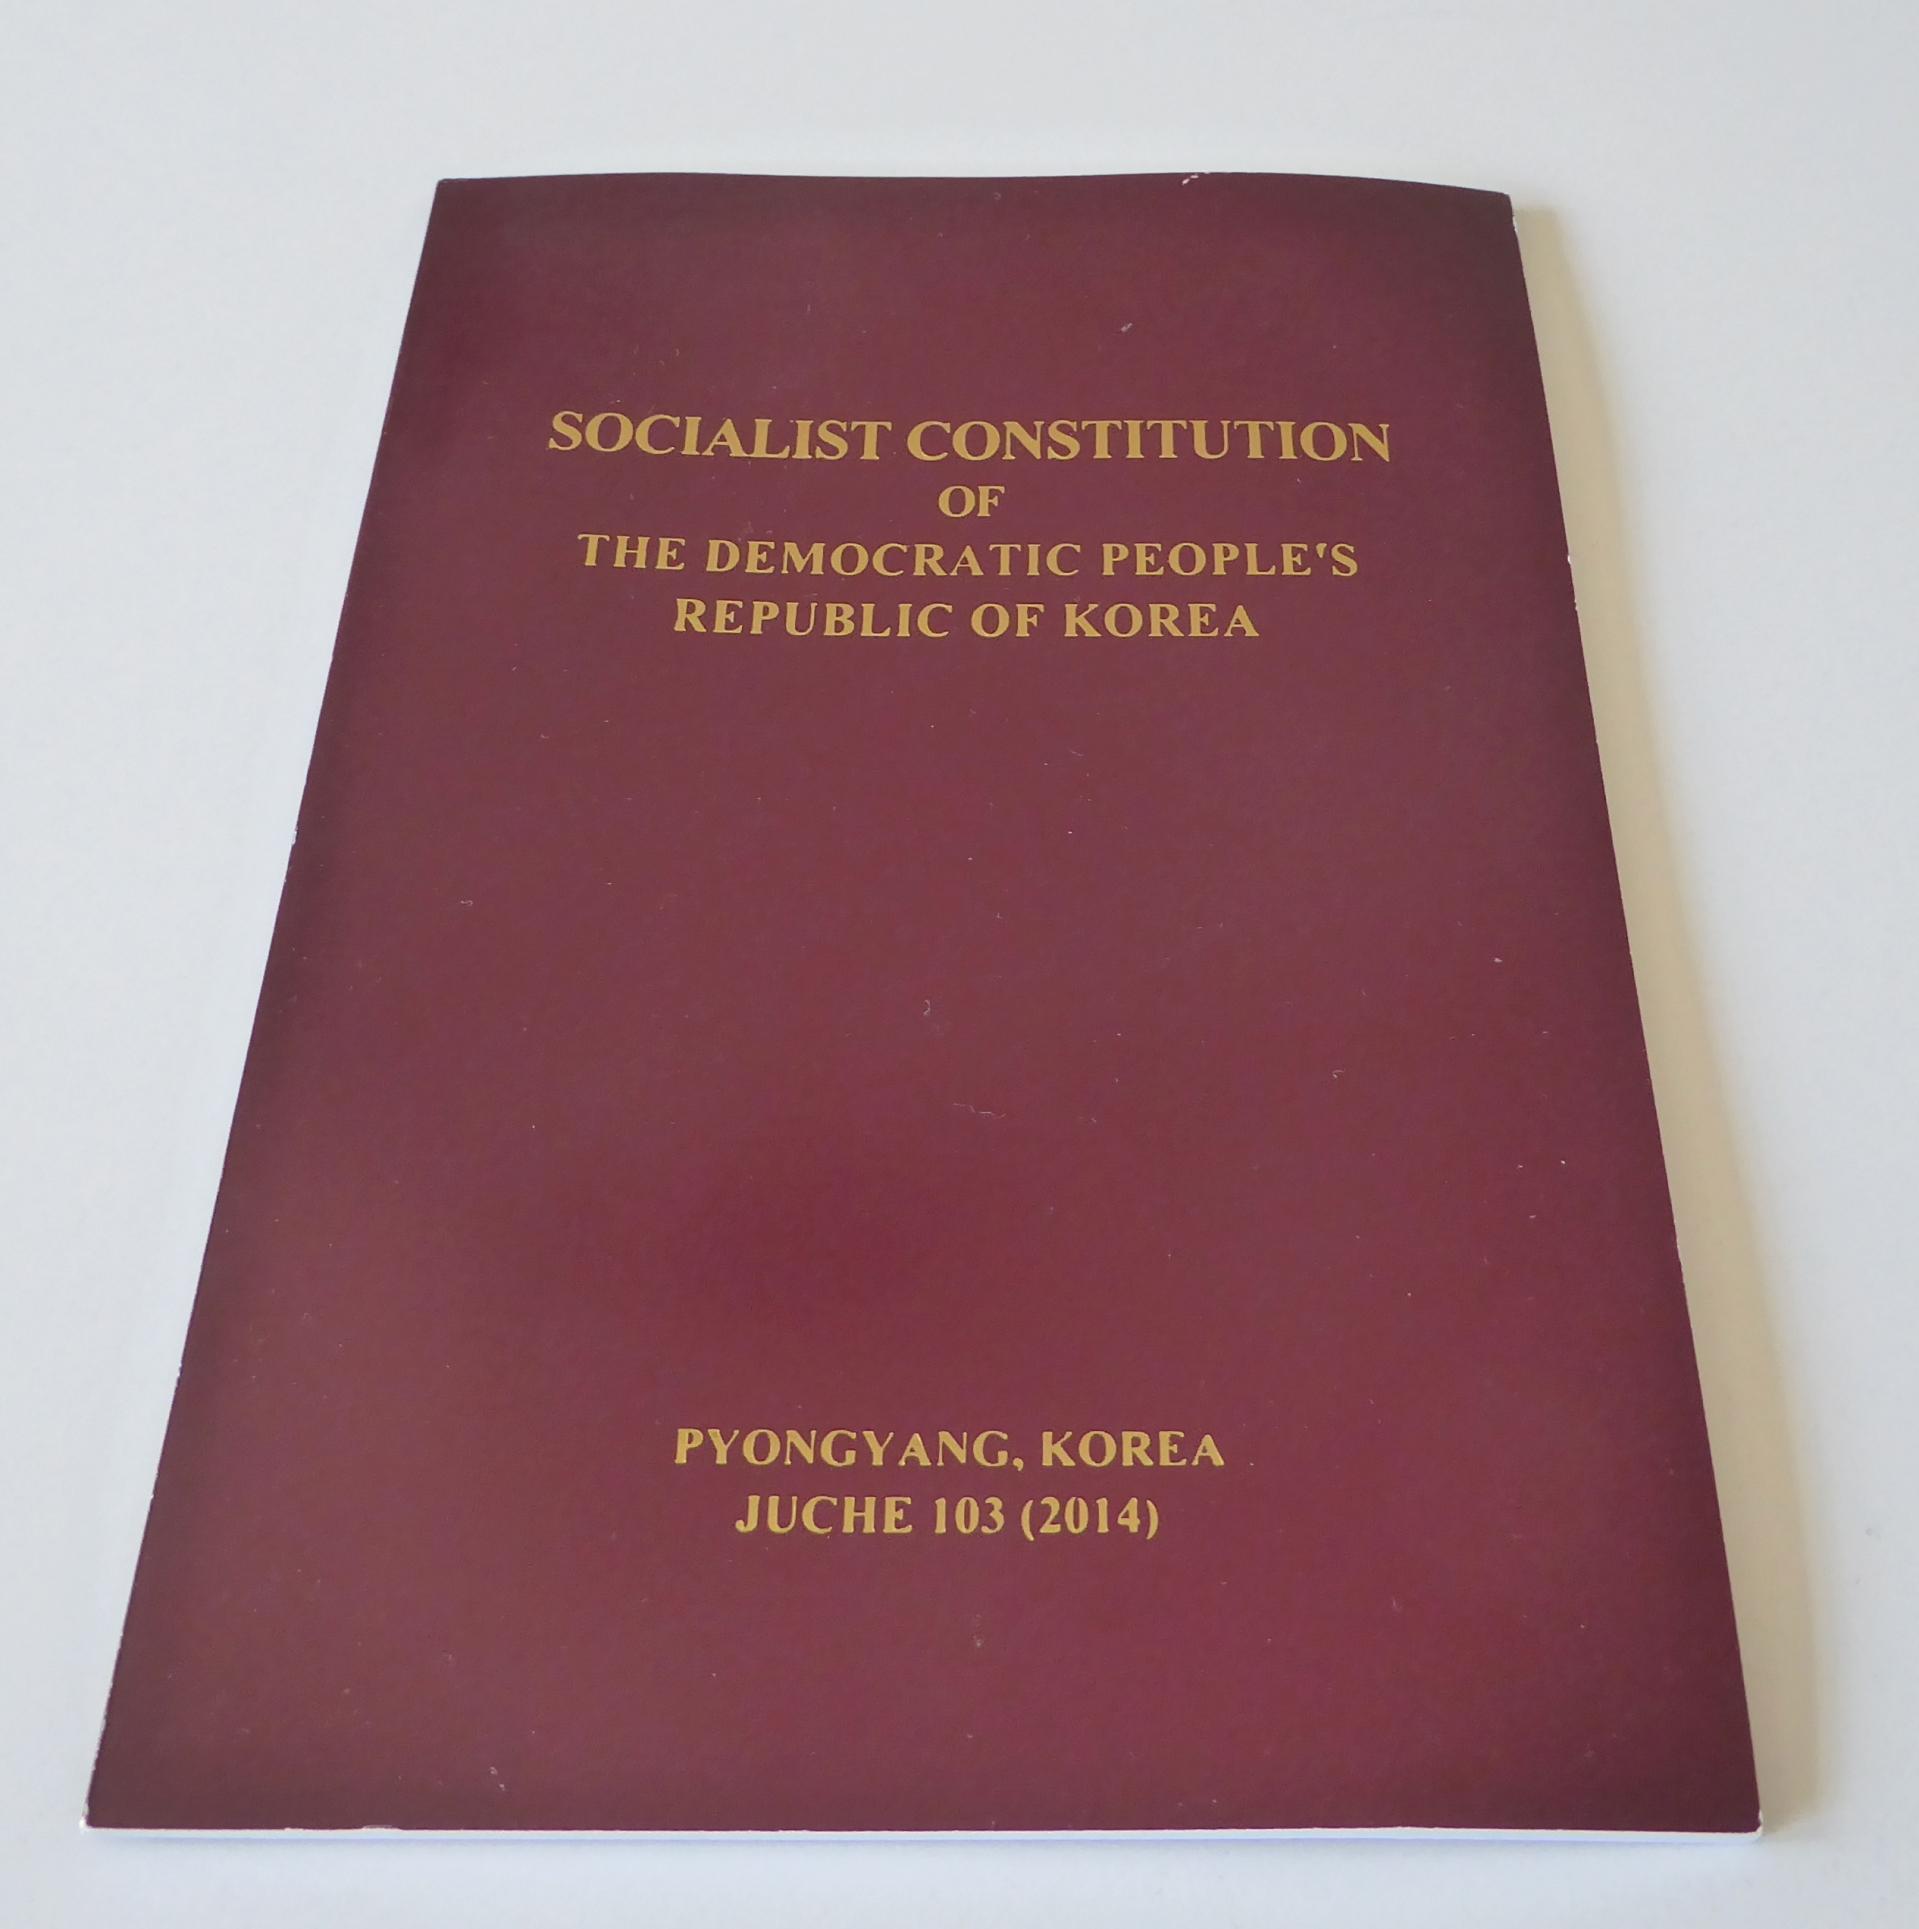 Socialist Constitution of the Democratic People's Republic of Korea Book North Korea souvenir souvenirs